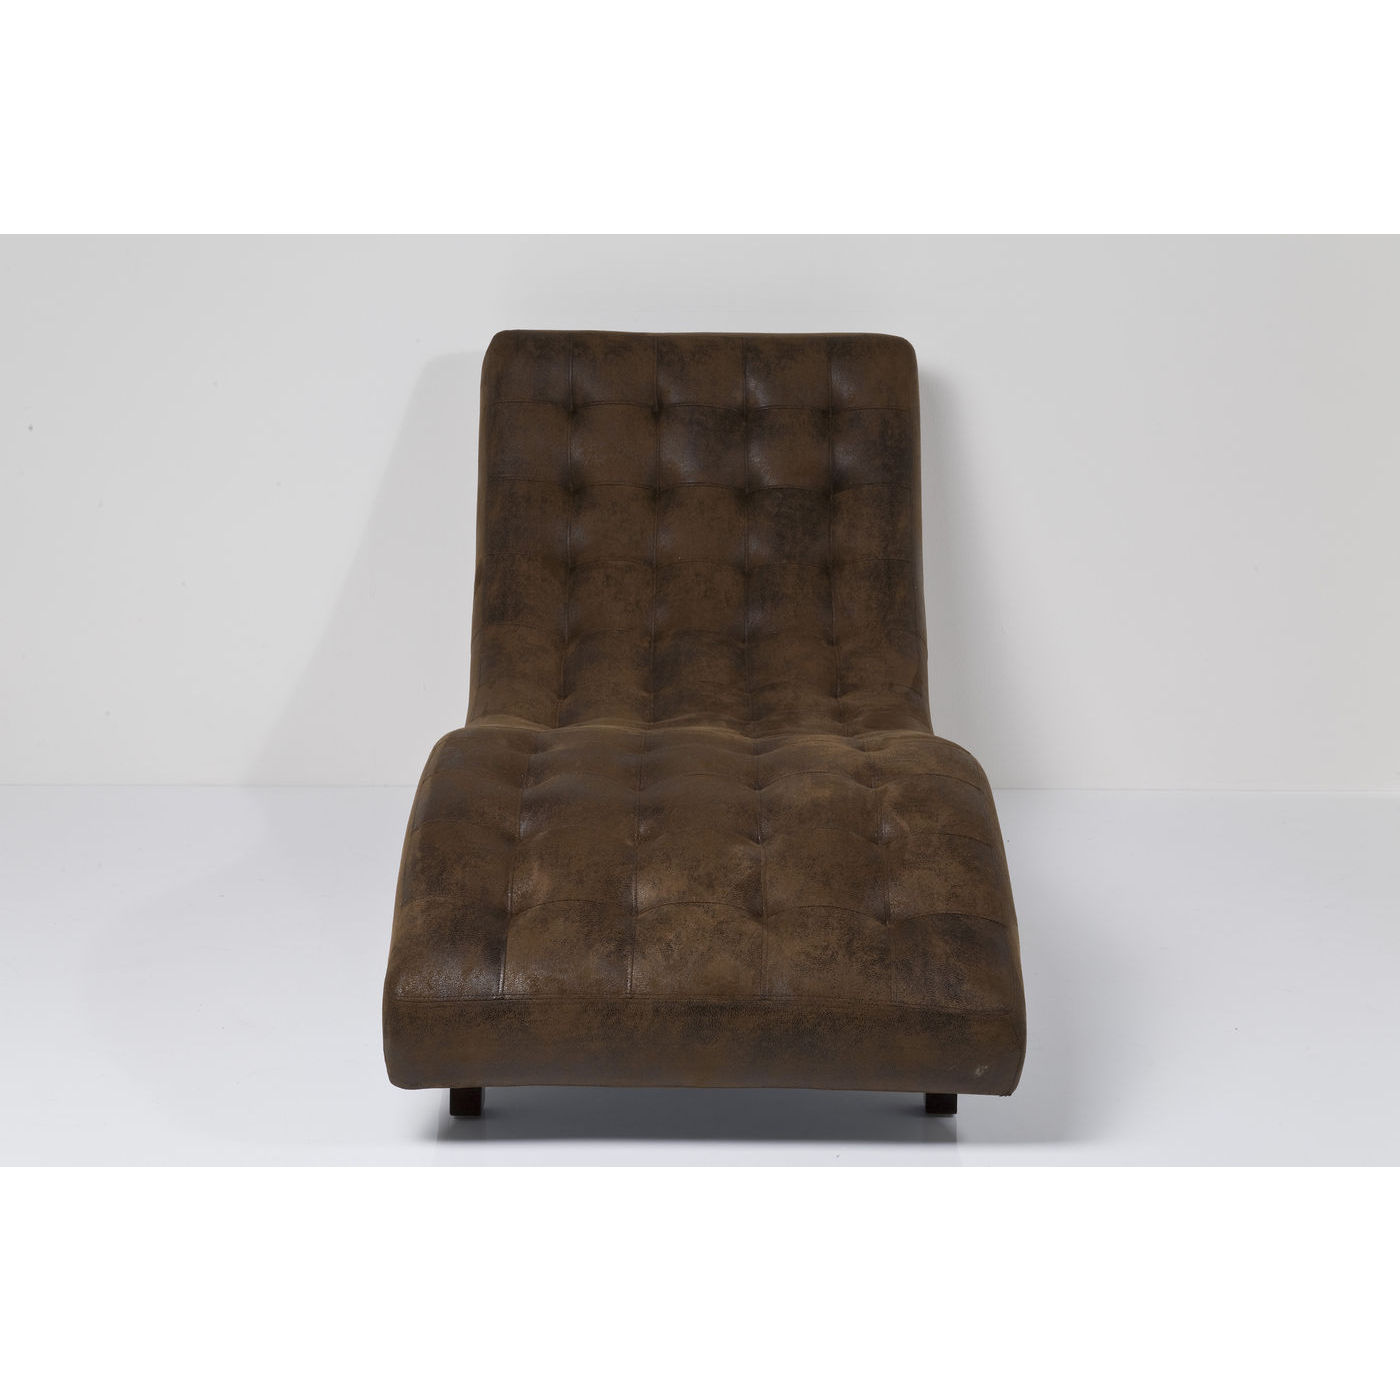 relaxliege liege sessel wellness recamiere chaiselounge. Black Bedroom Furniture Sets. Home Design Ideas